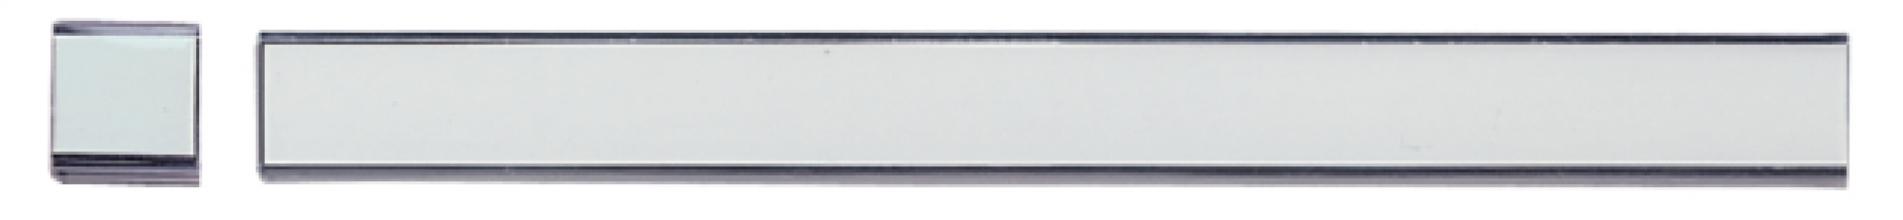 Planbord verbindingsprofiel A5545-002 2stuks